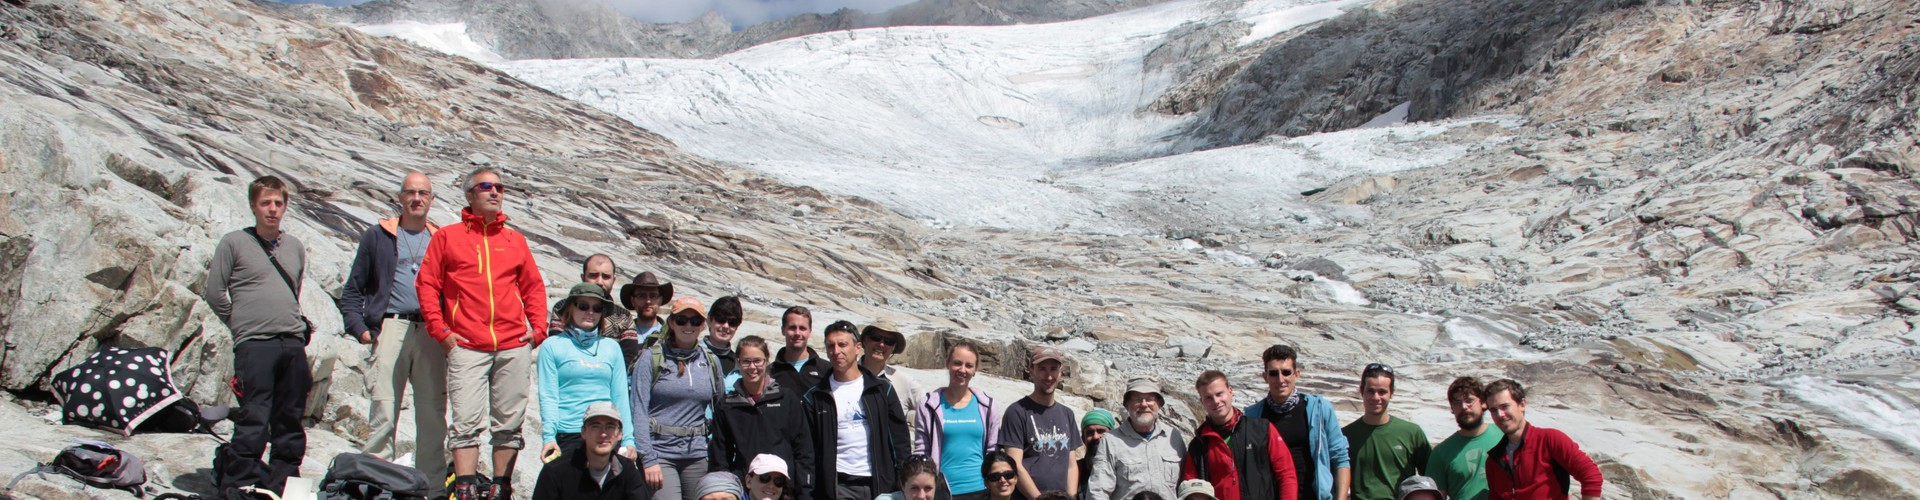 EGU summer school 2015 (Credit: Organisers of the 1st EGU Summer School on Structural Analysis of Crystalline Rocks)